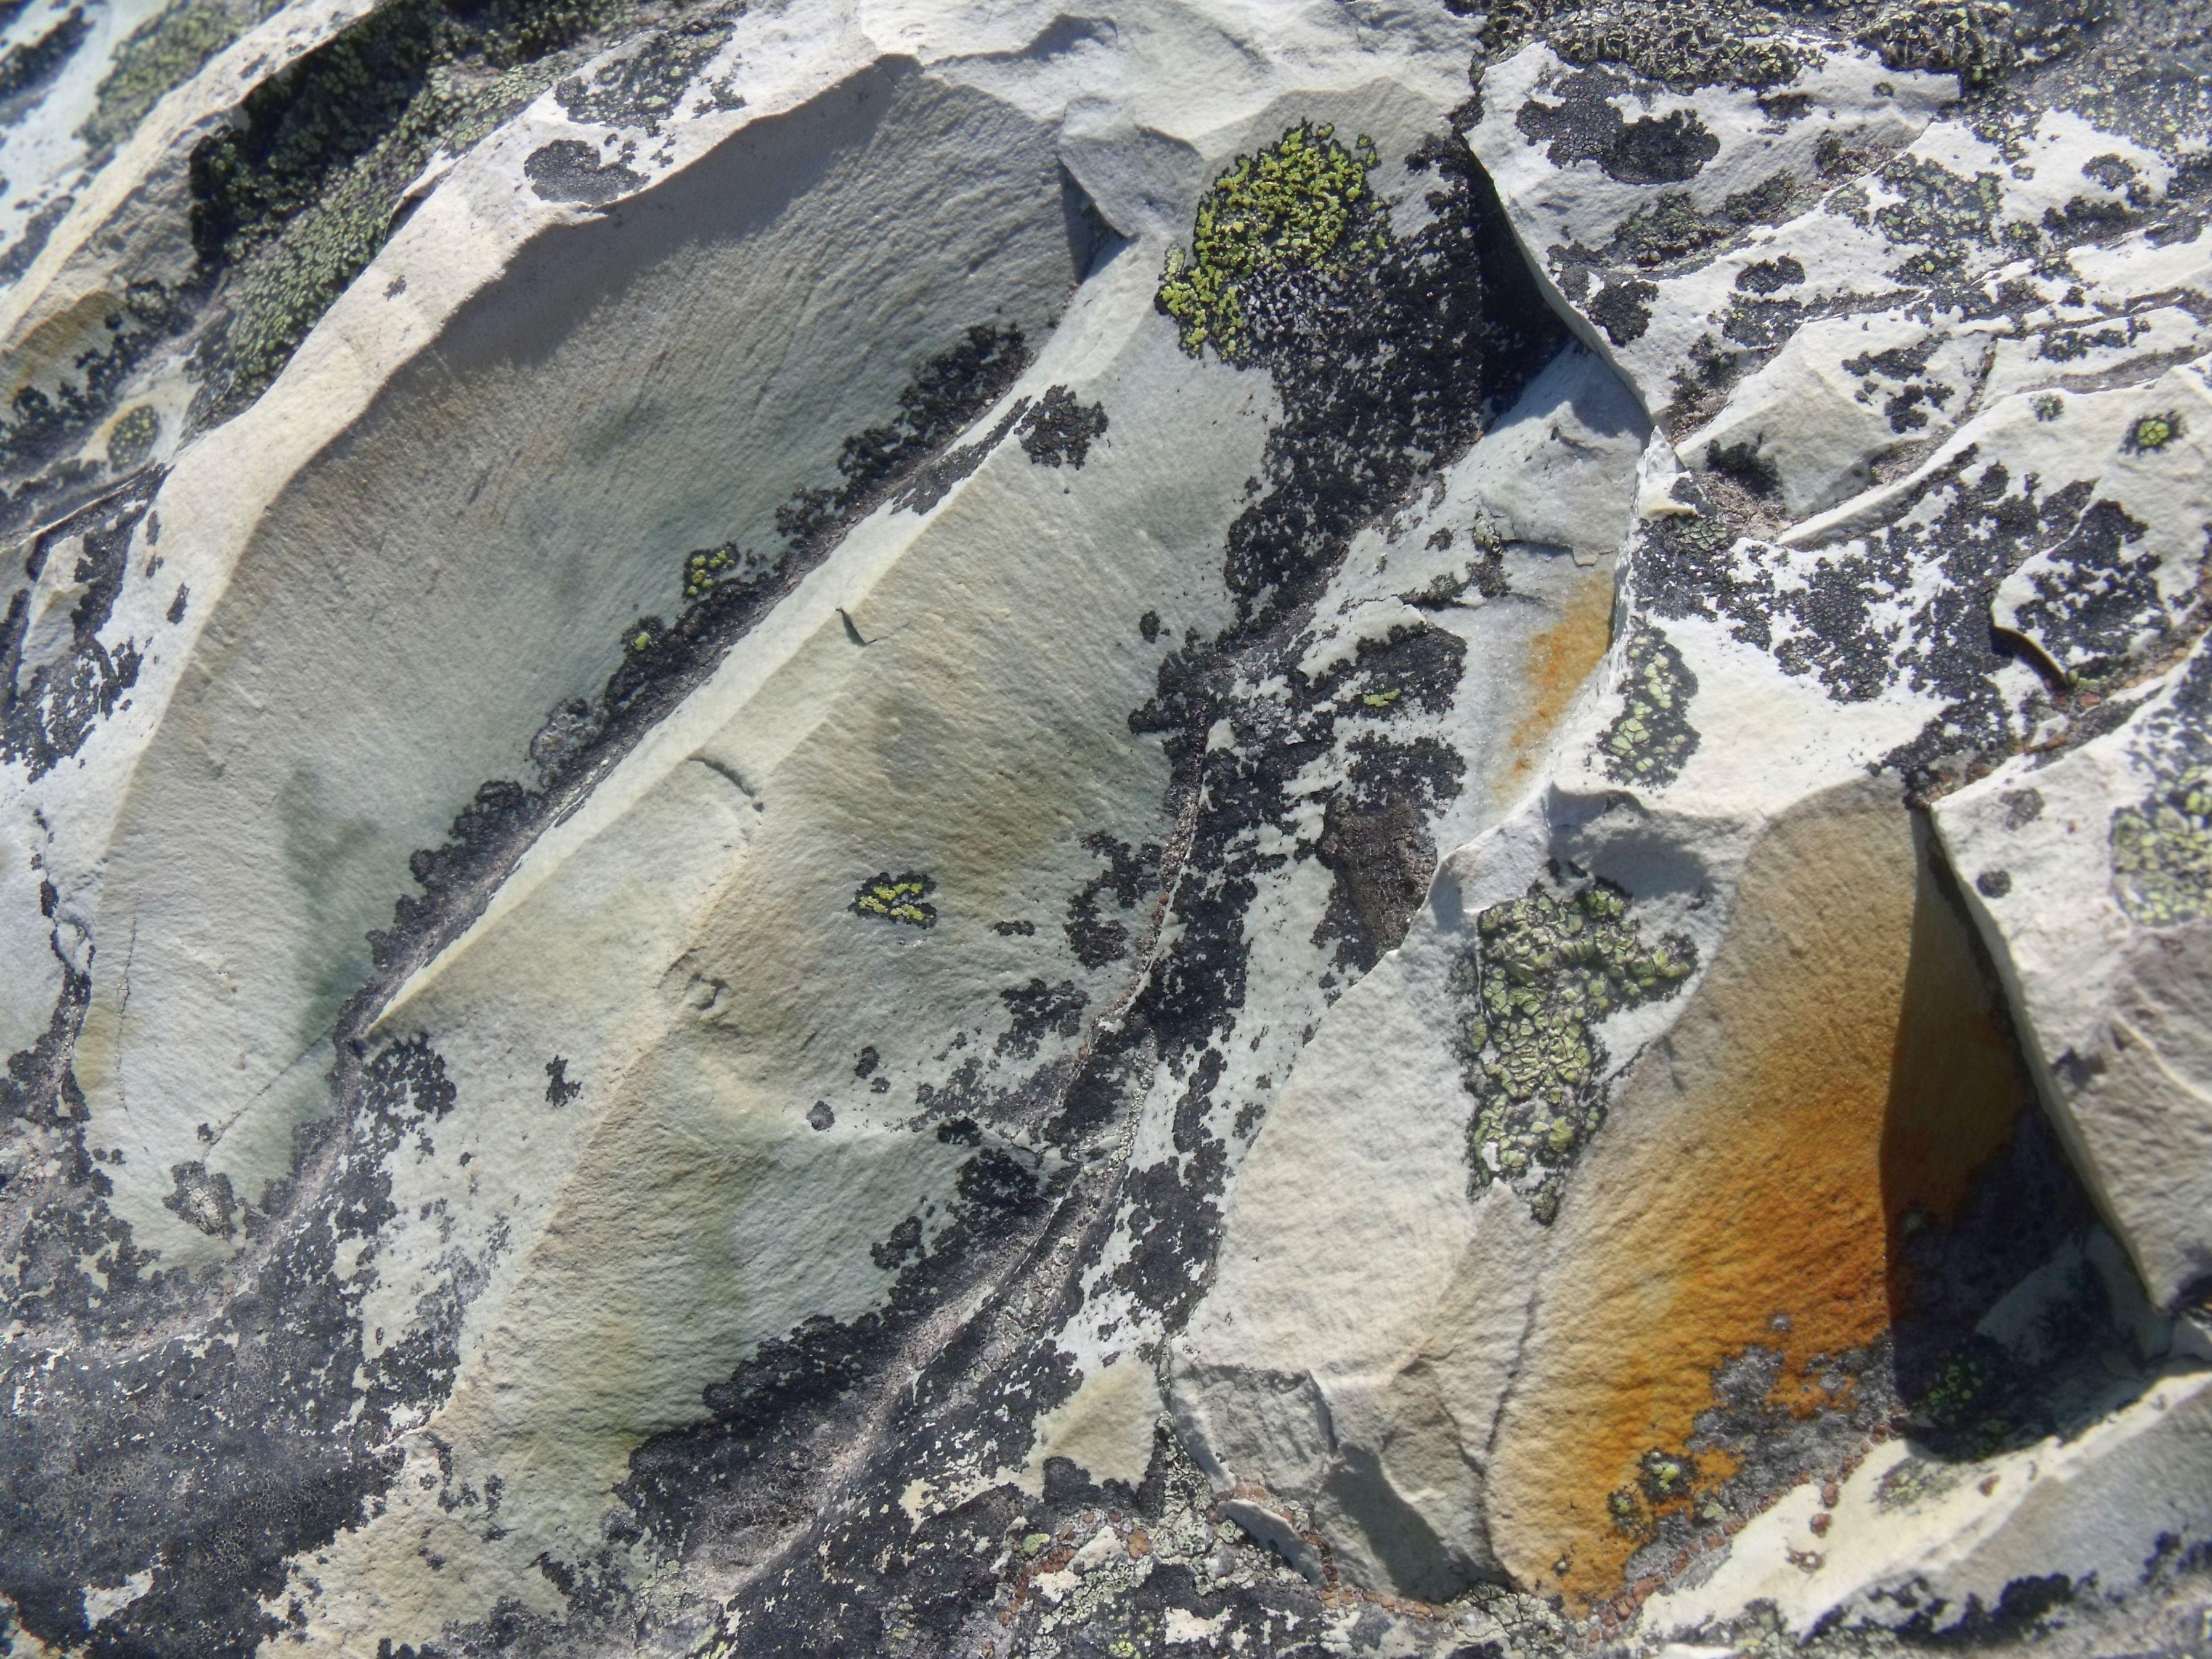 rockonrock1568